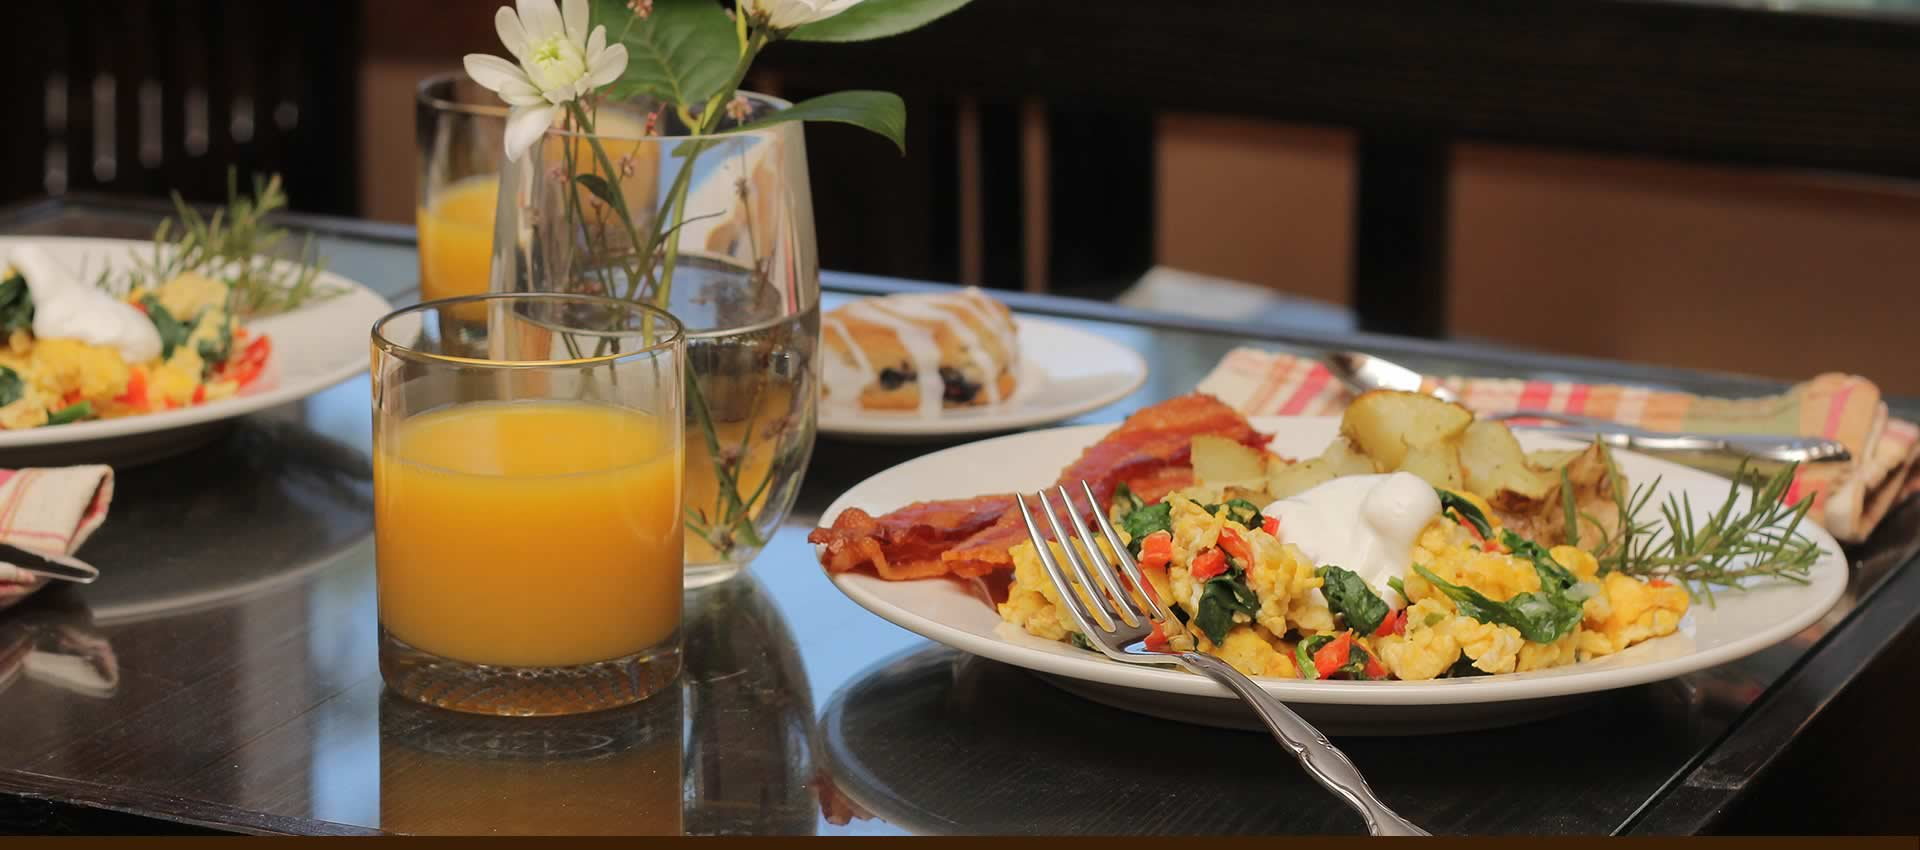 Grand-Idyllwild-breakfast1